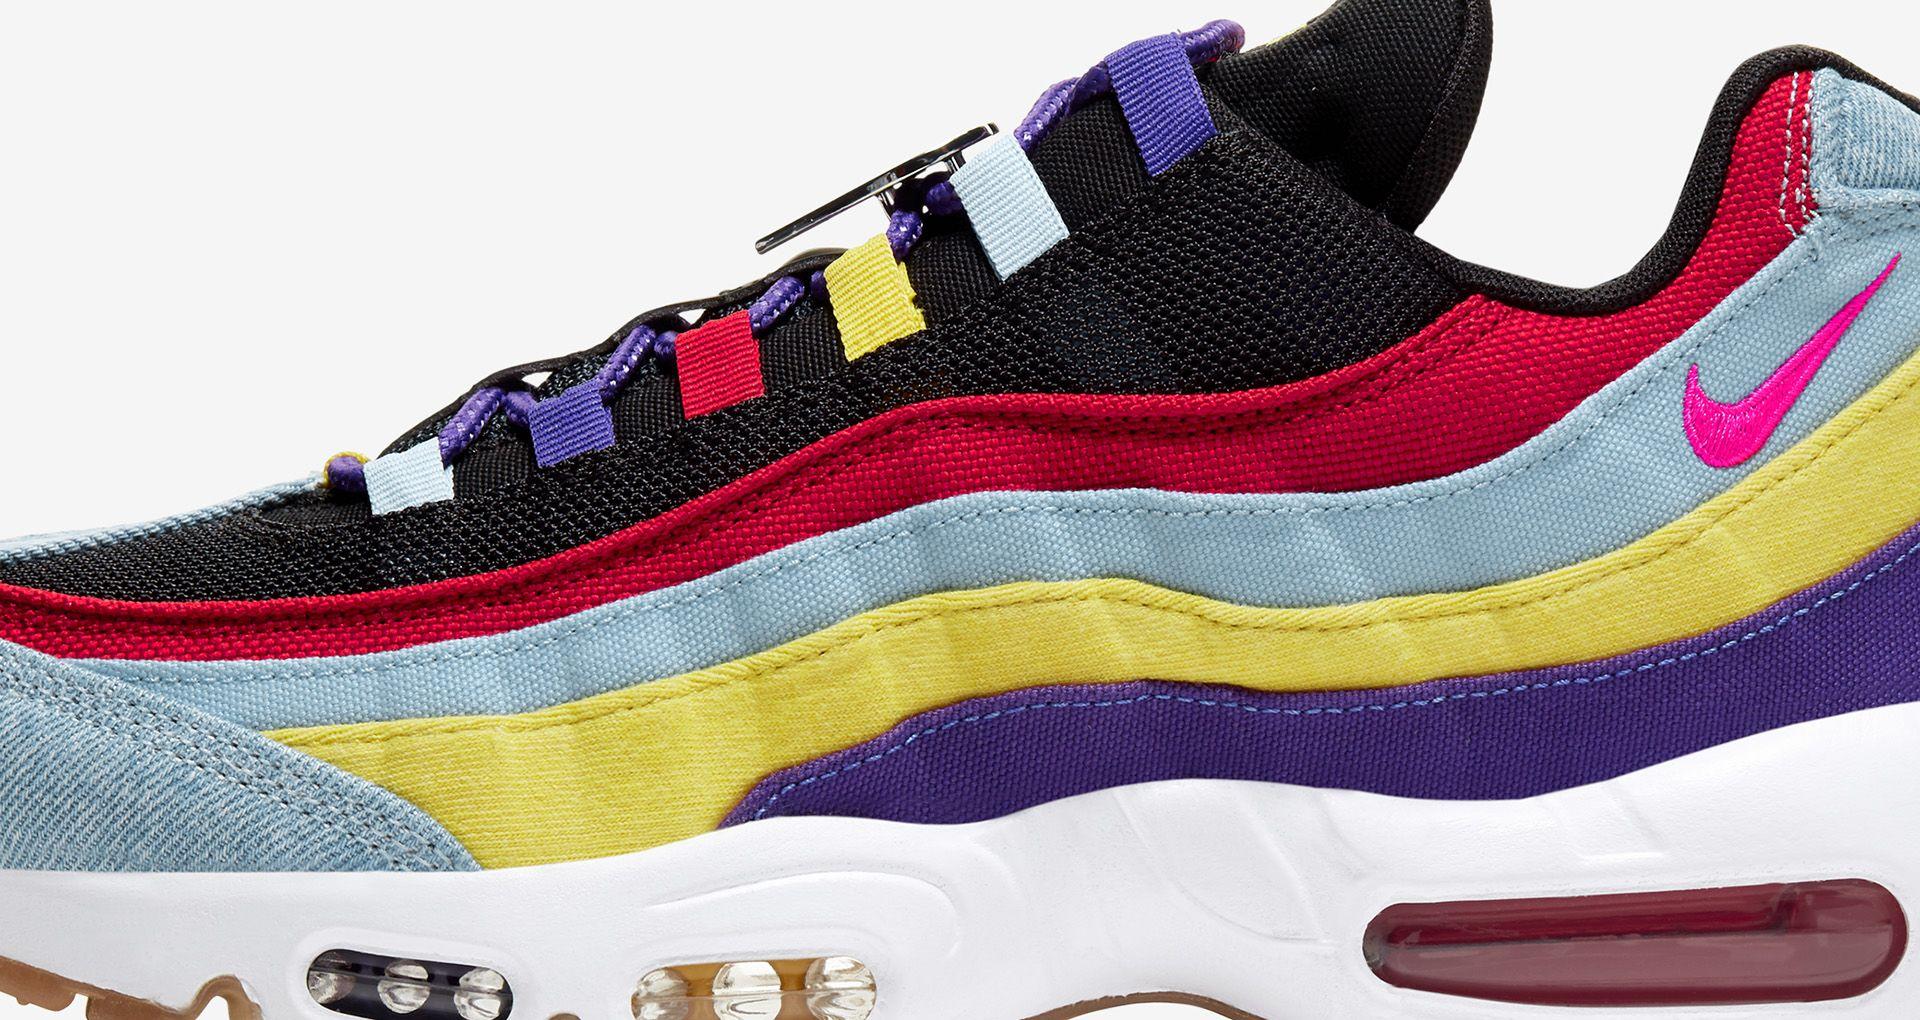 7Y Nike Air Max 95 pink and purple